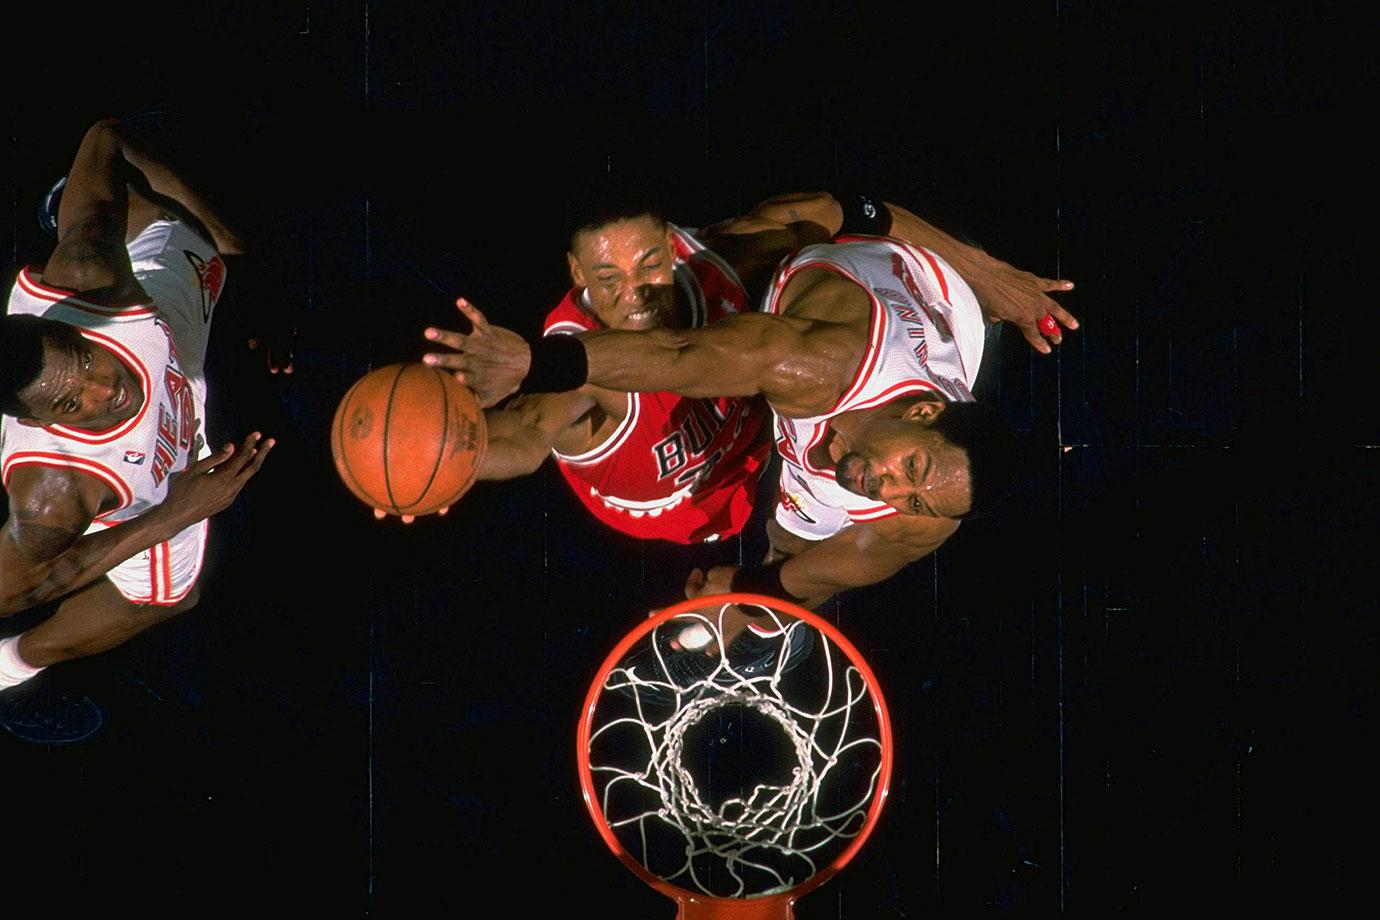 February 23, 1996 —Chicago Bulls vs. Miami Heat